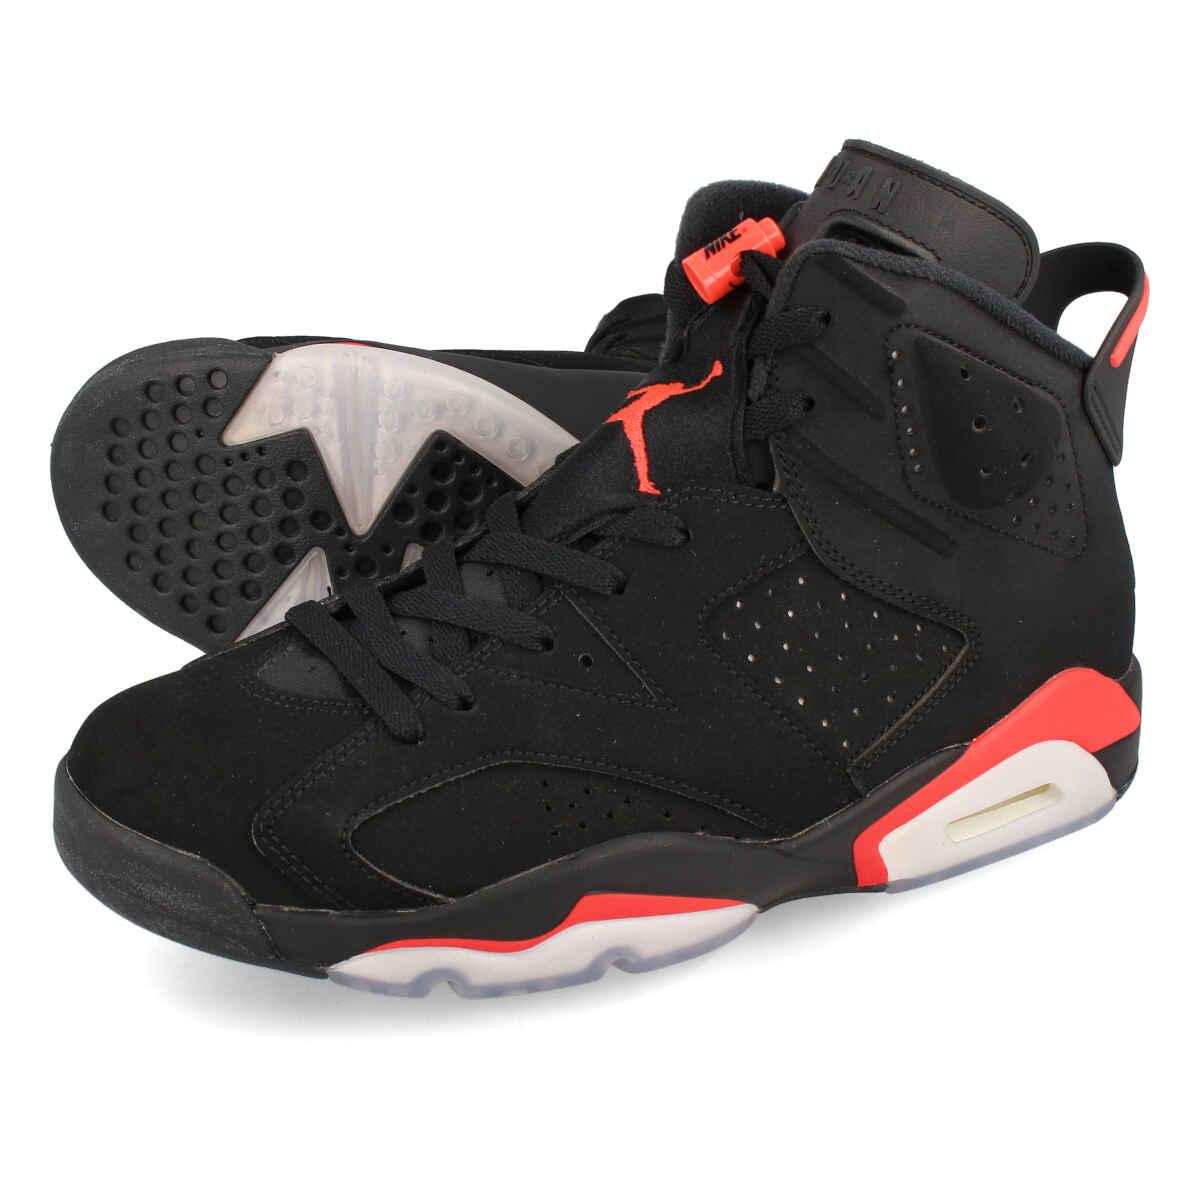 8380607d1dc97 LOWTEX PLUS: NIKE AIR JORDAN 6 RETRO GS Nike Air Jordan 6 nostalgic GS BLACK /INFRARED 384,665-060 | Rakuten Global Market